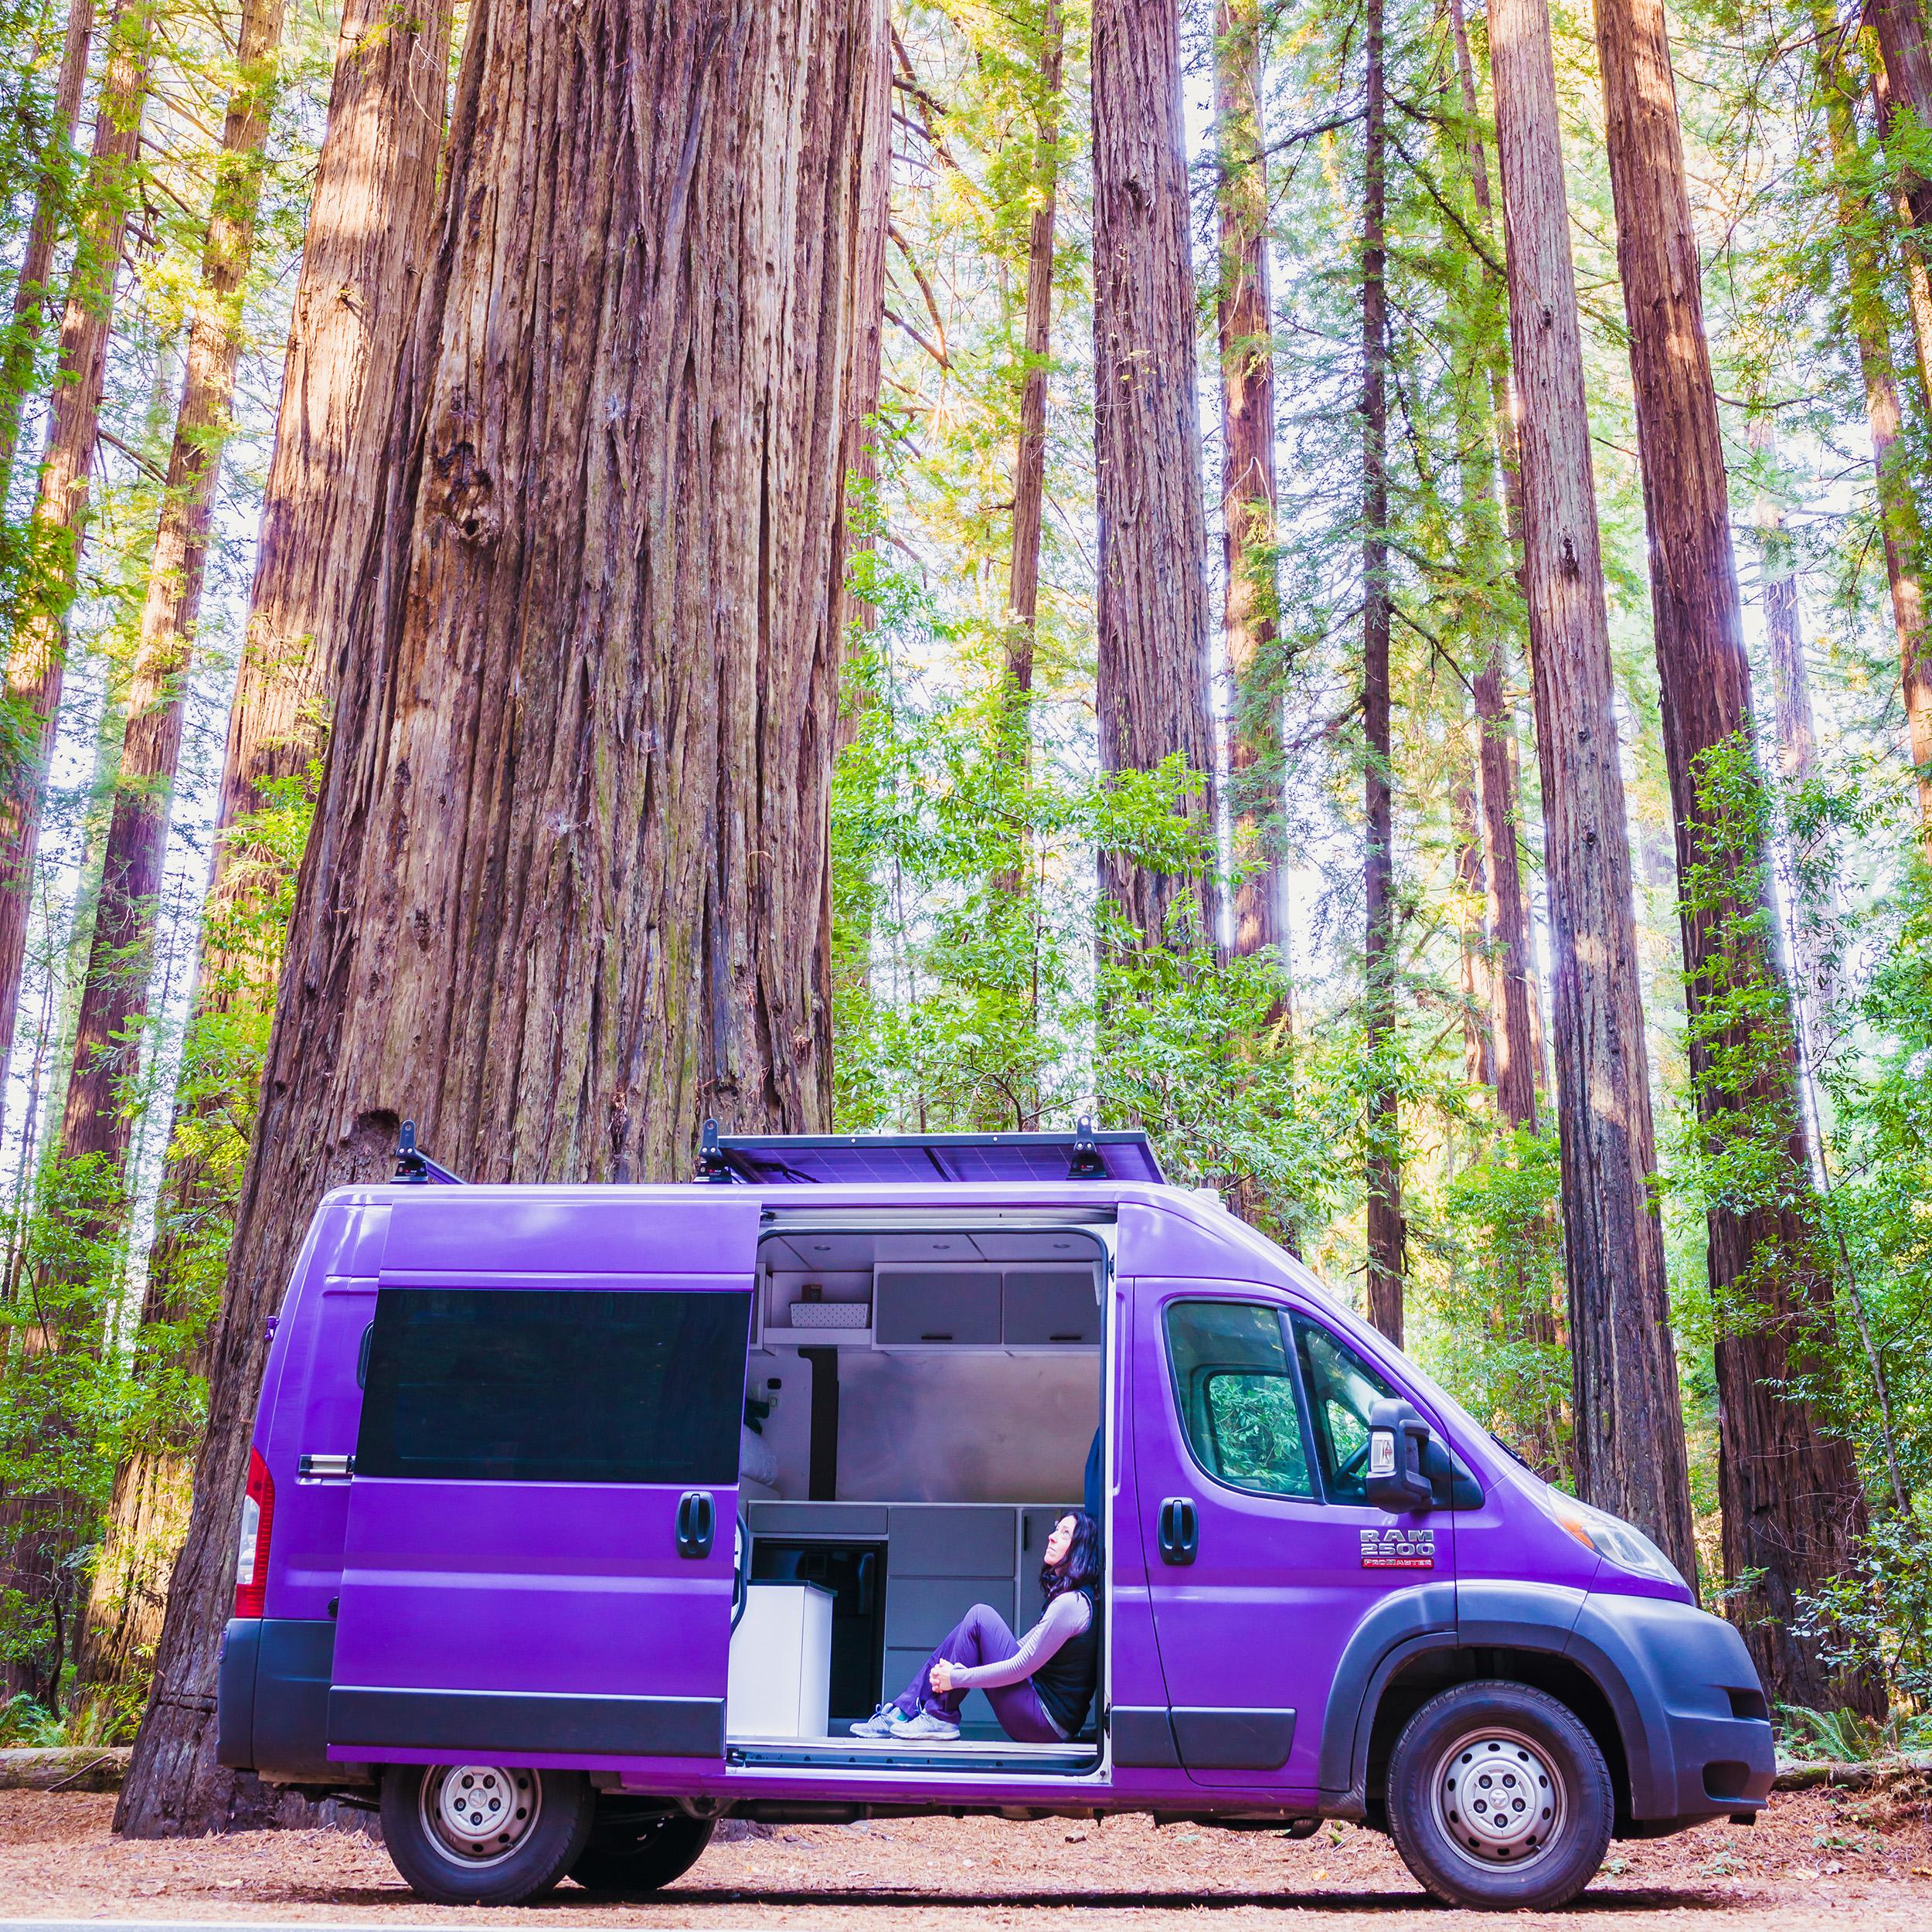 California | Redwood National Park